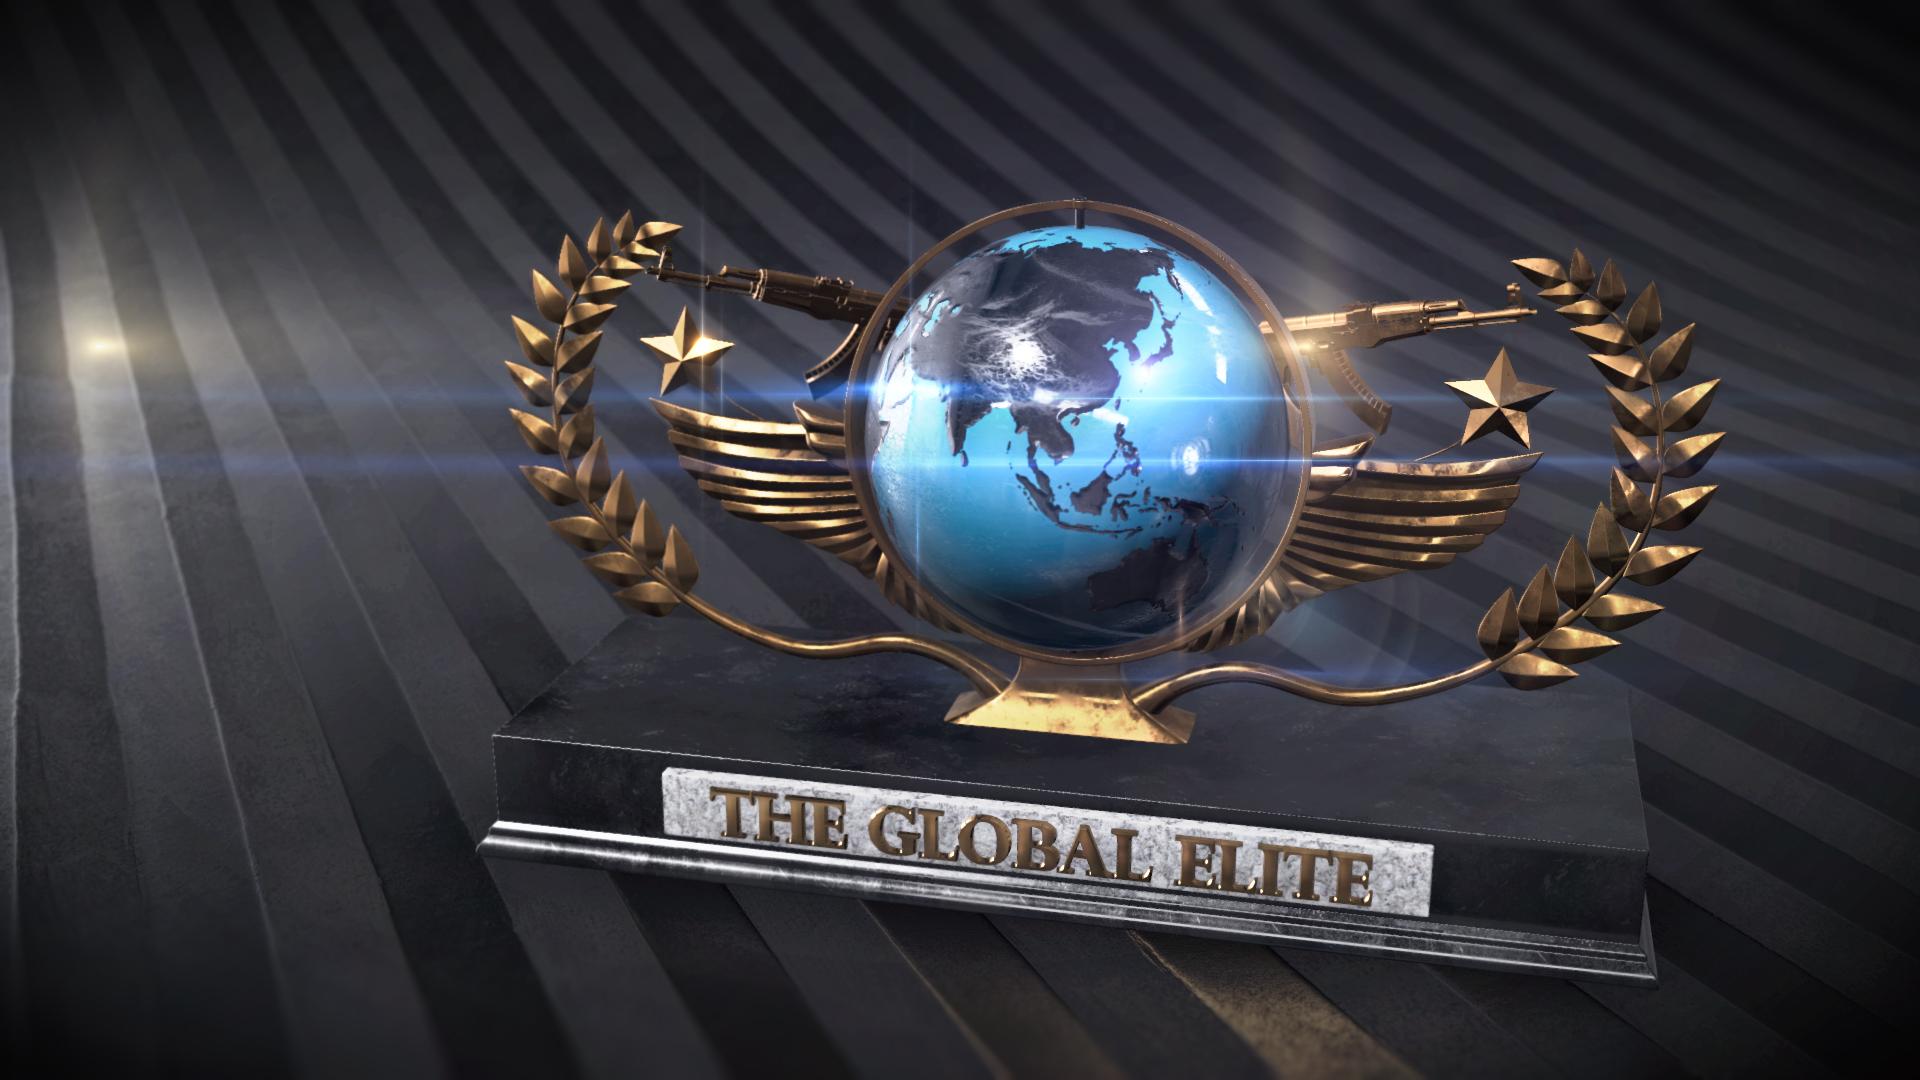 глобал элит фото